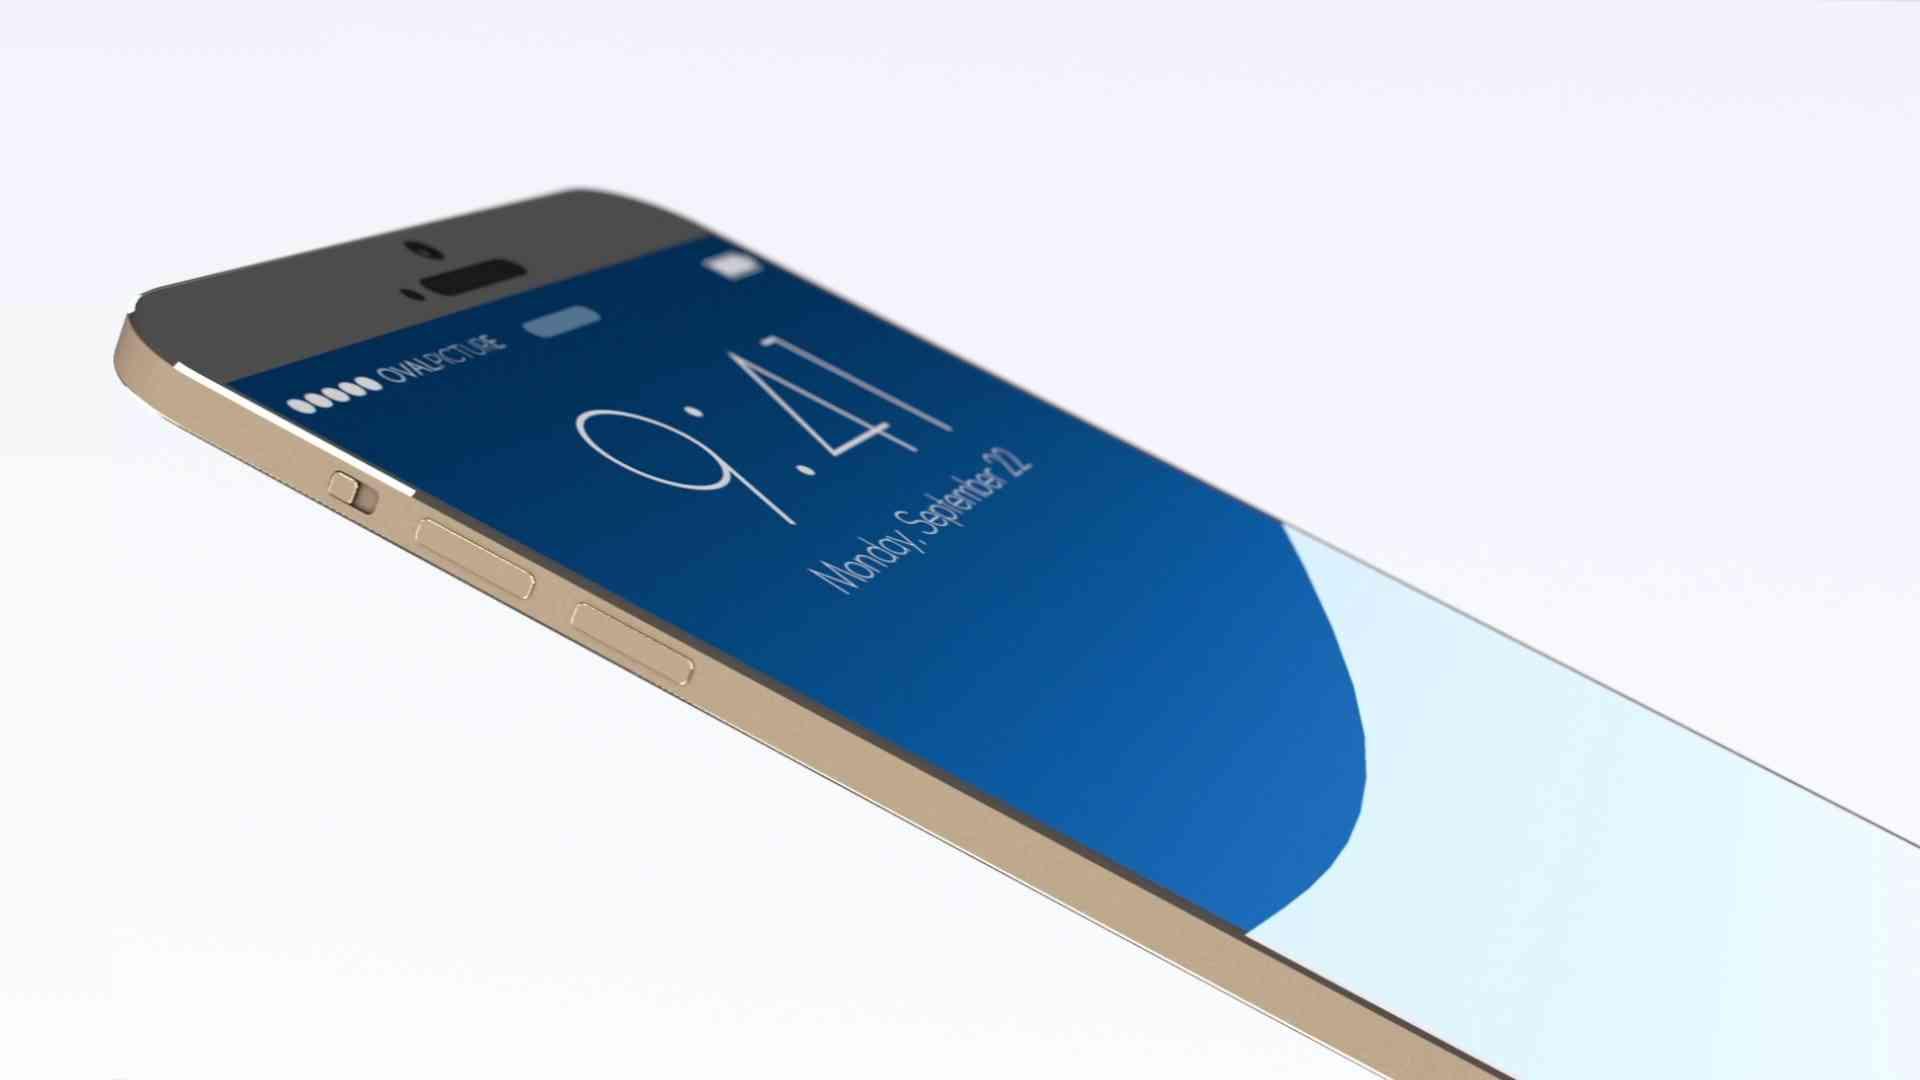 iPhone6は9月発売 5.5インチ画面など2モデル展開へ